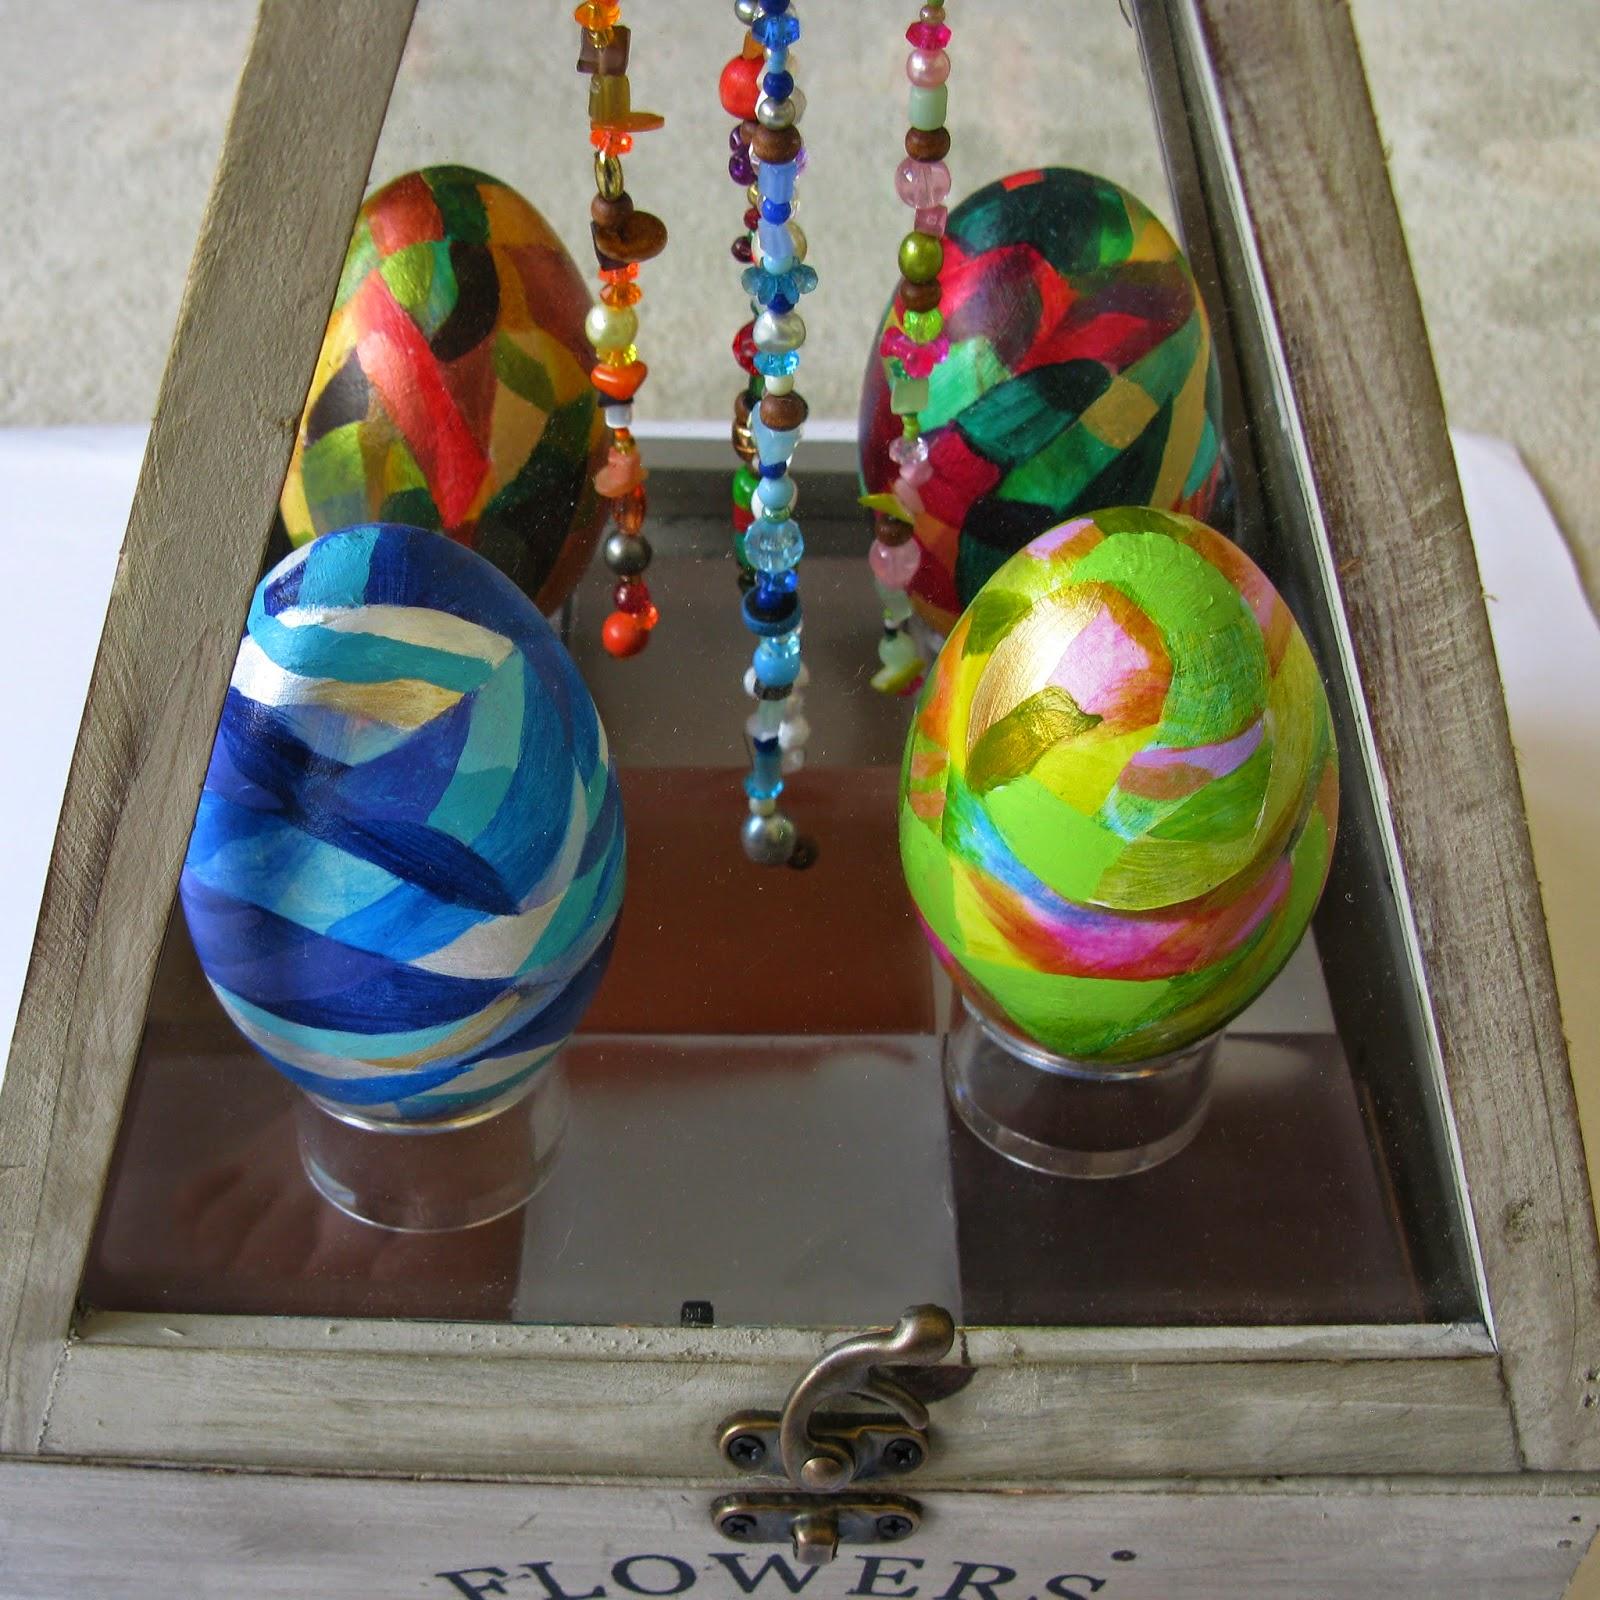 http://www.openfields.org/Eggs2014/kahn1.htm